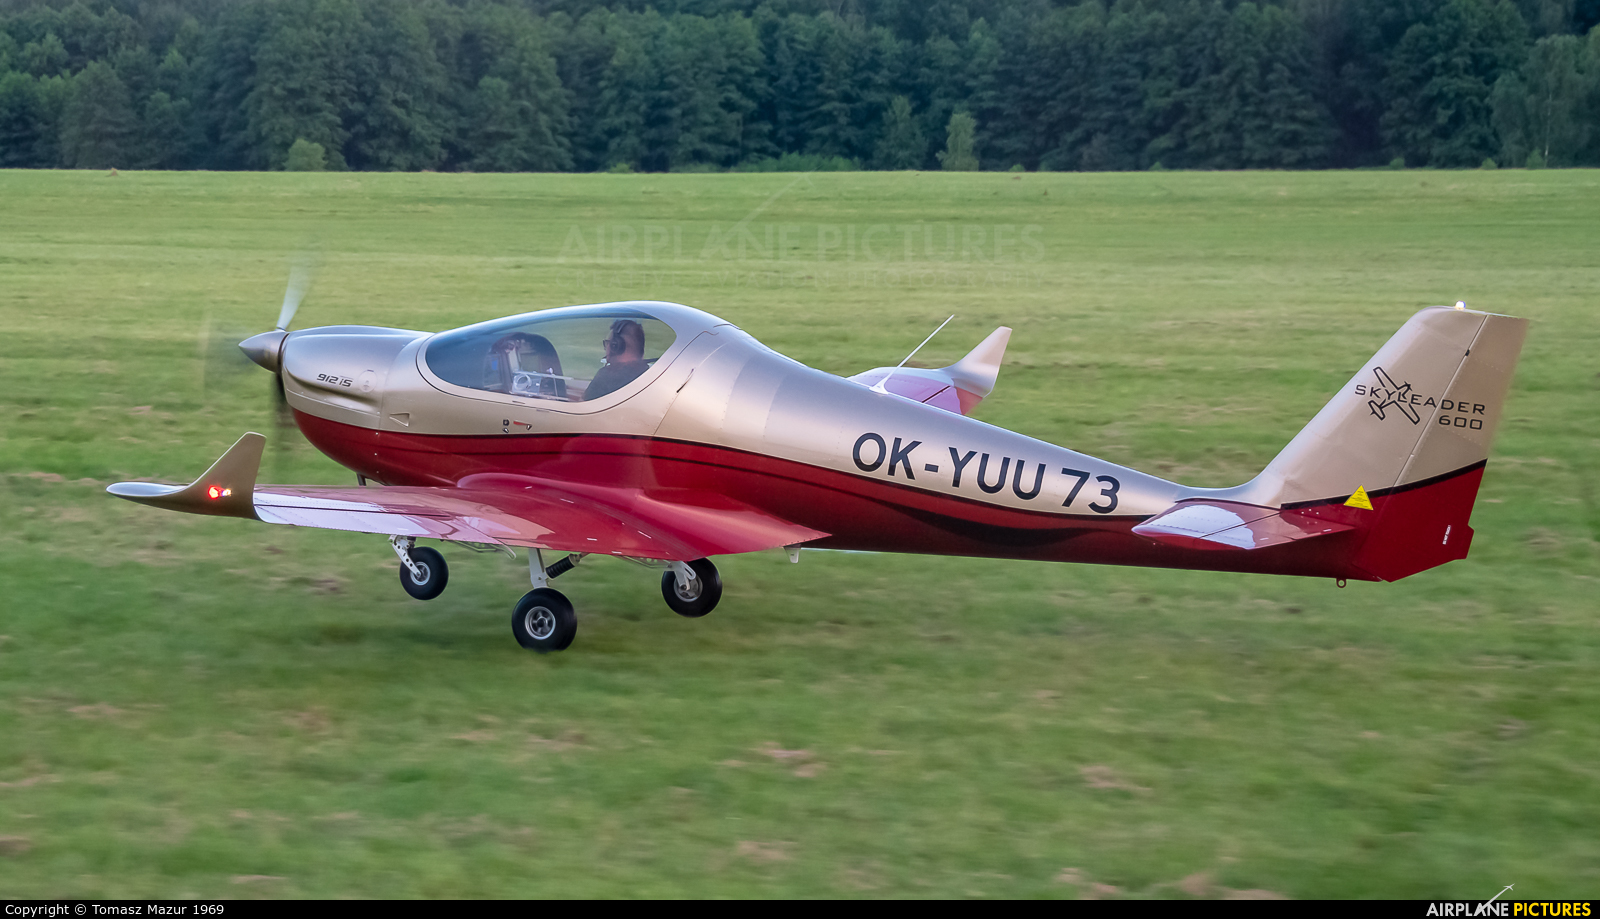 Private OK-YUU 73 aircraft at Rybnik - Gotartowice